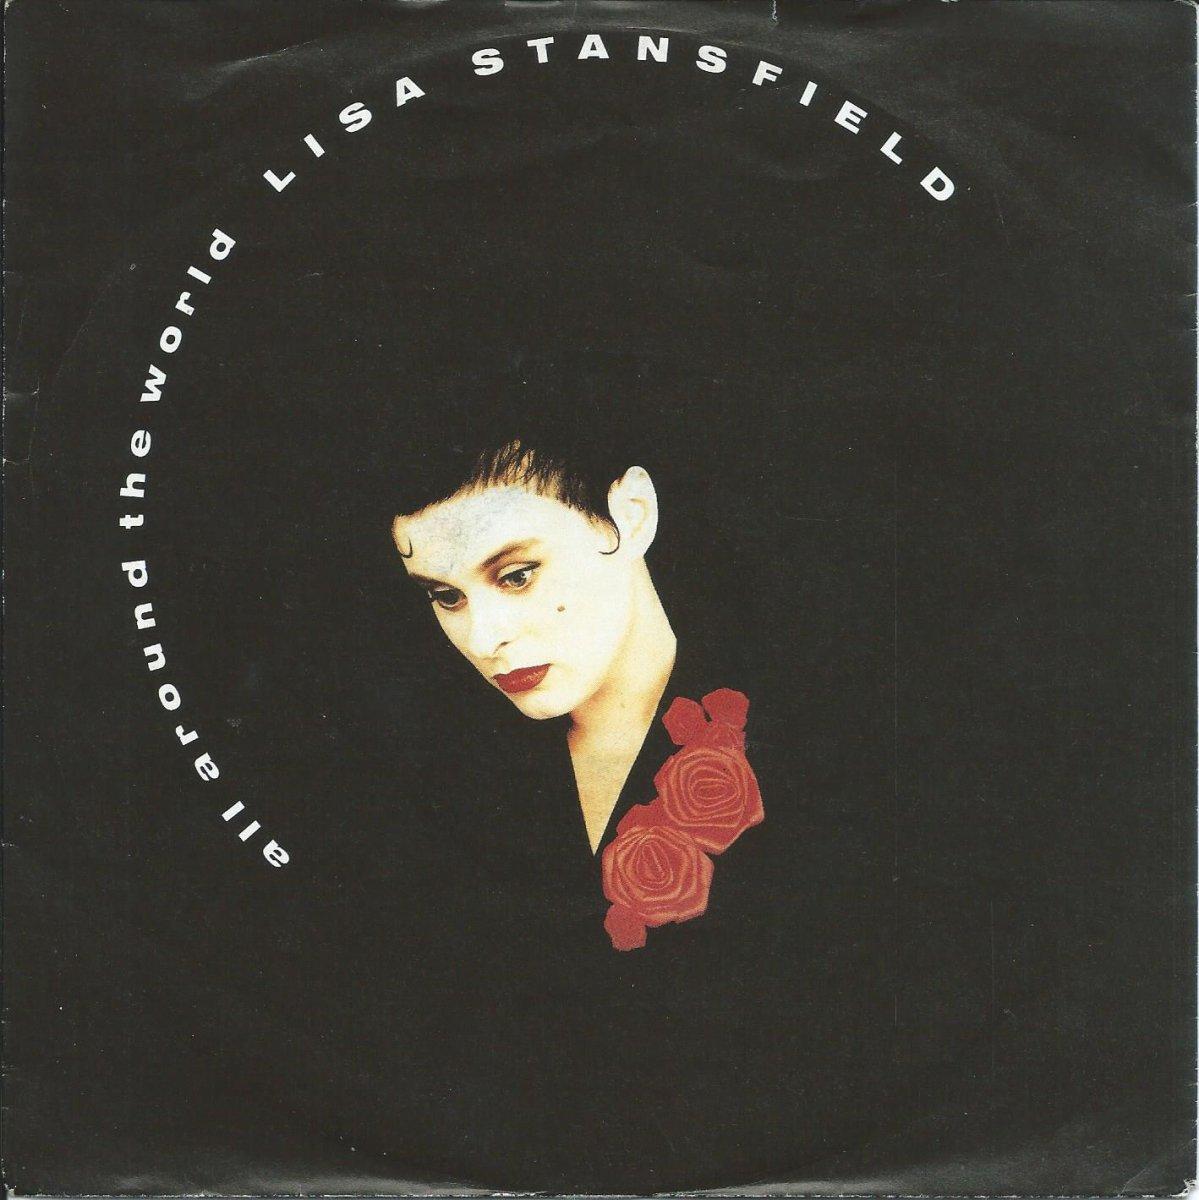 LISA STANSFIELD / ALL AROUND THE WORLD / WAKE UP BABY (7